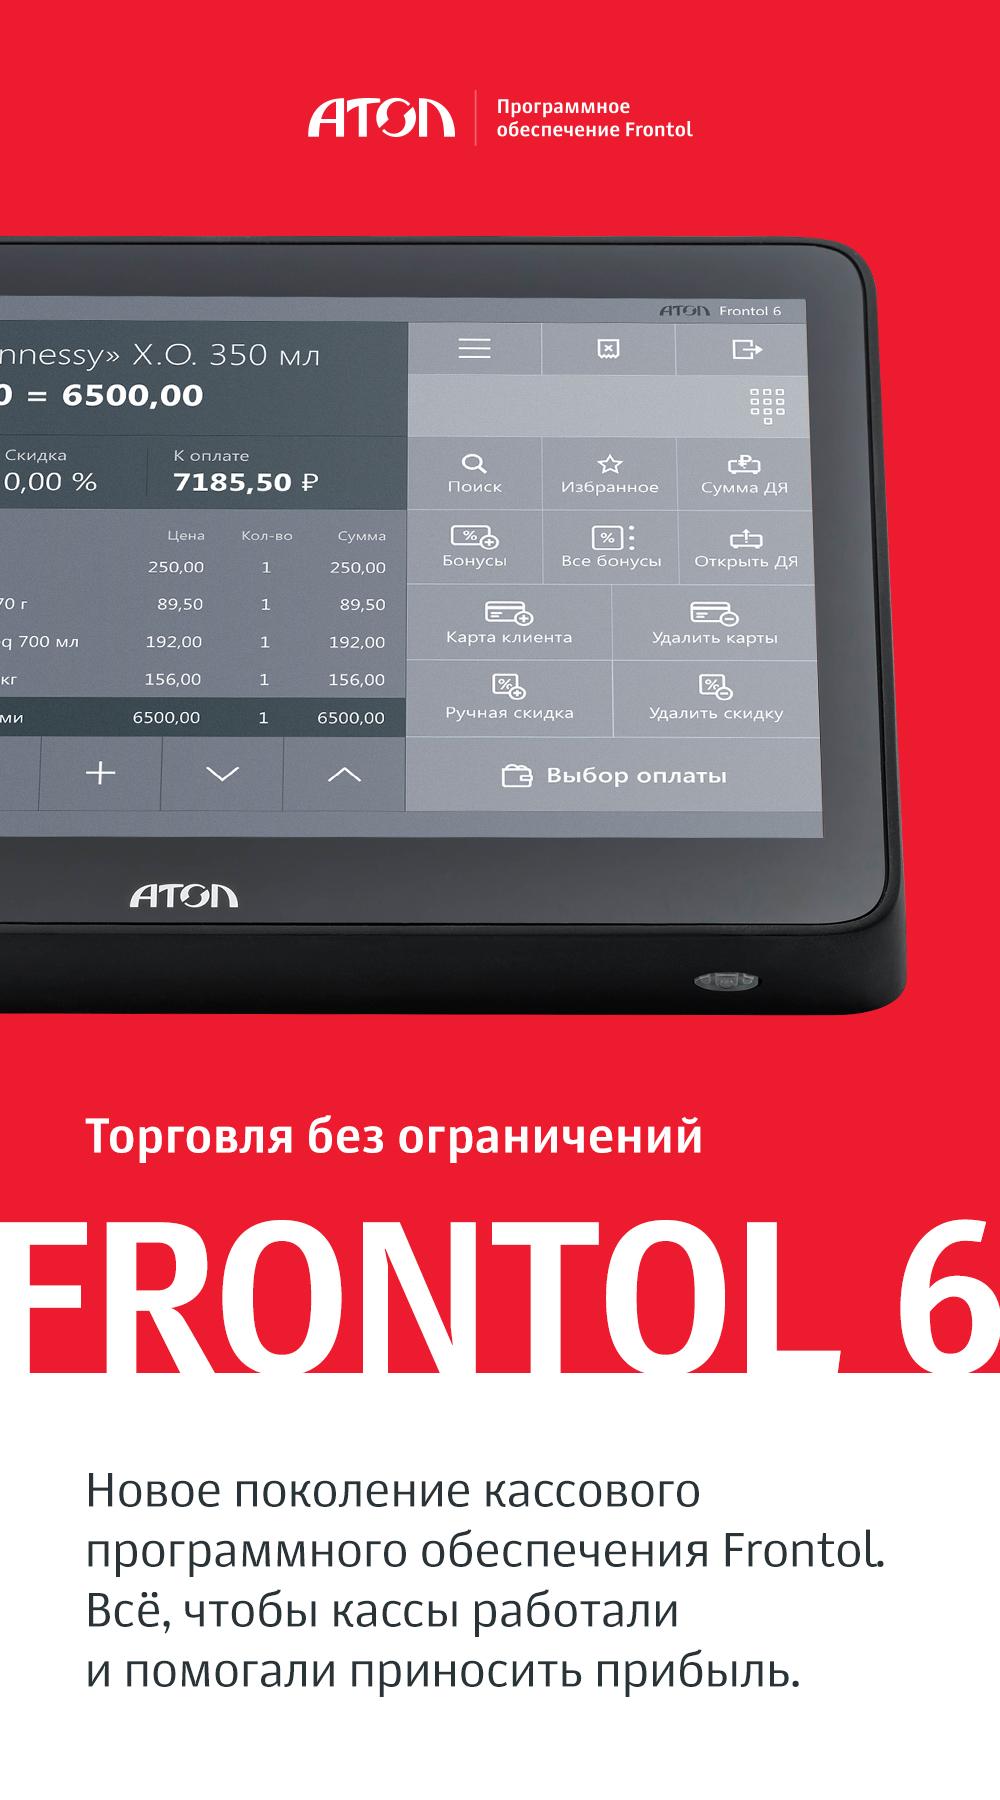 FRONTOL6